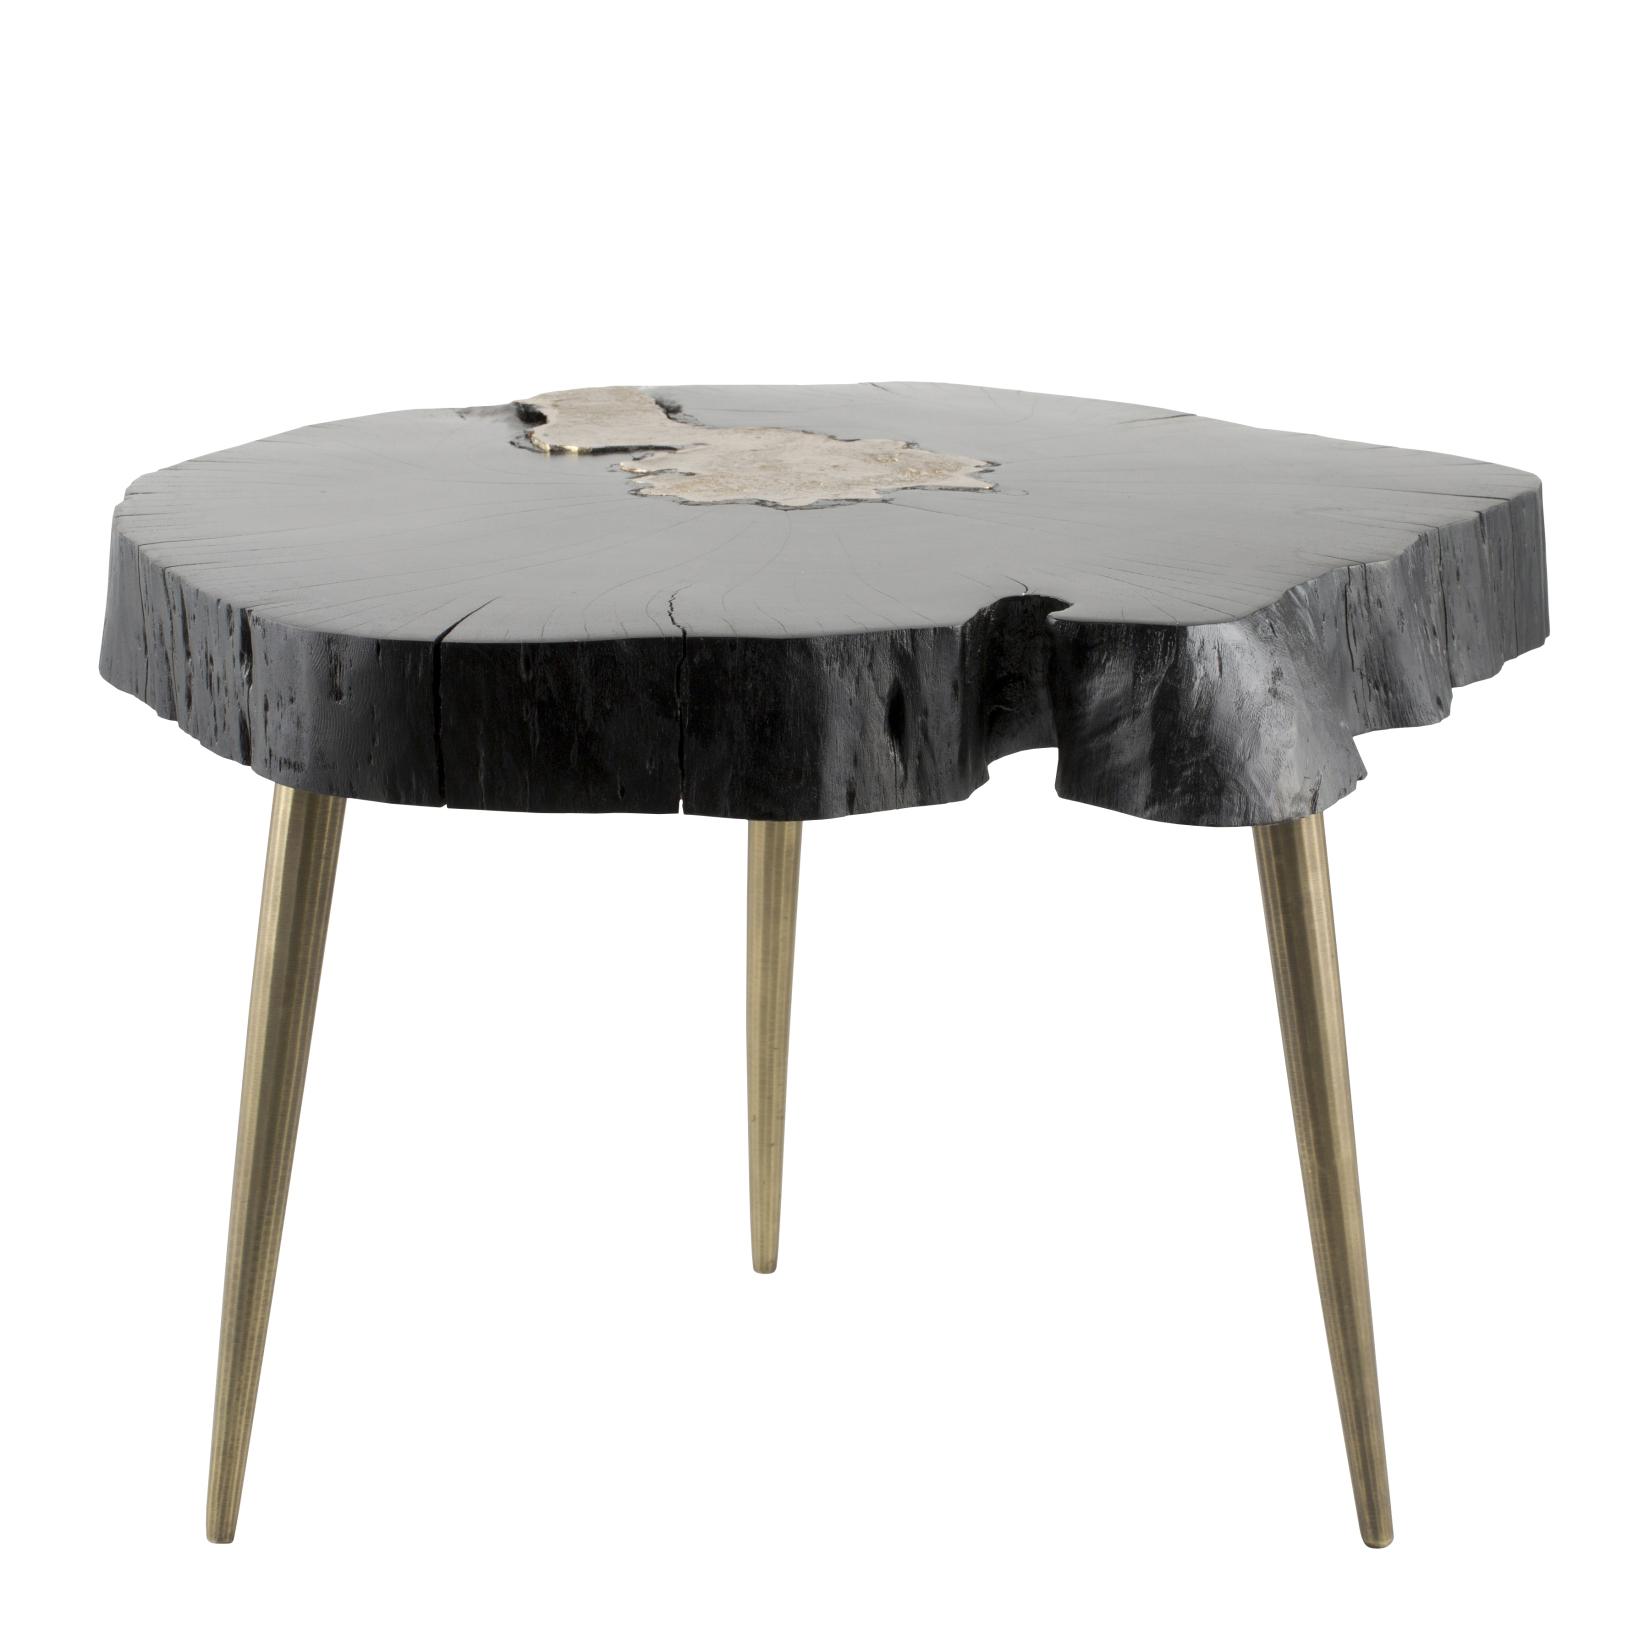 lene bjerre m bel villatmo de villatmo designer m bel lampen accessoires. Black Bedroom Furniture Sets. Home Design Ideas